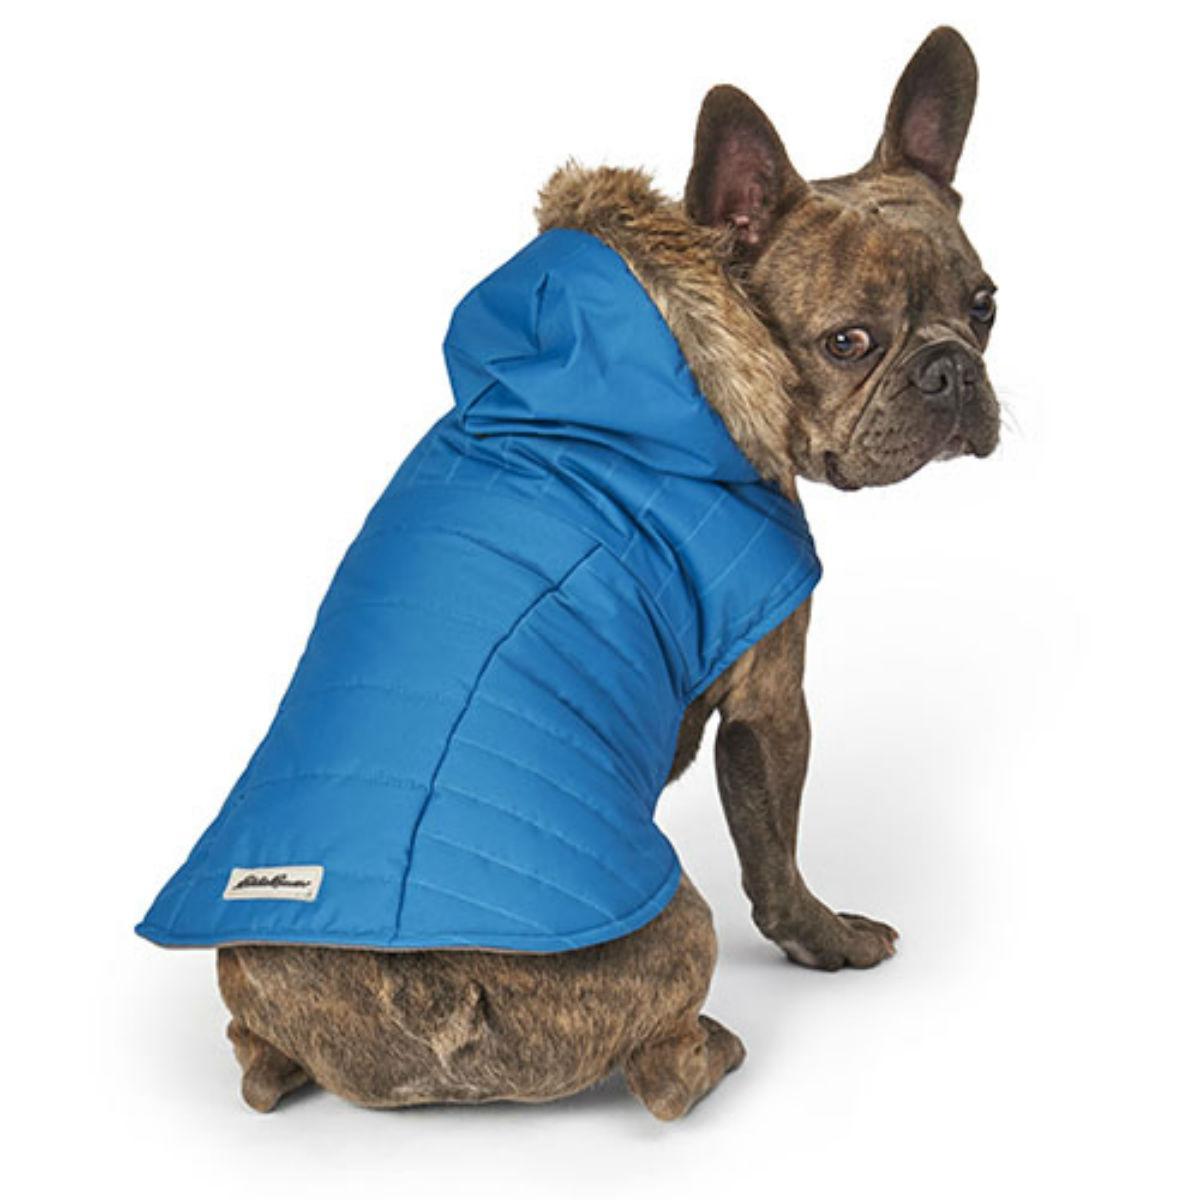 Eddie Bauer Chinook Hooded Dog Parka - Teal